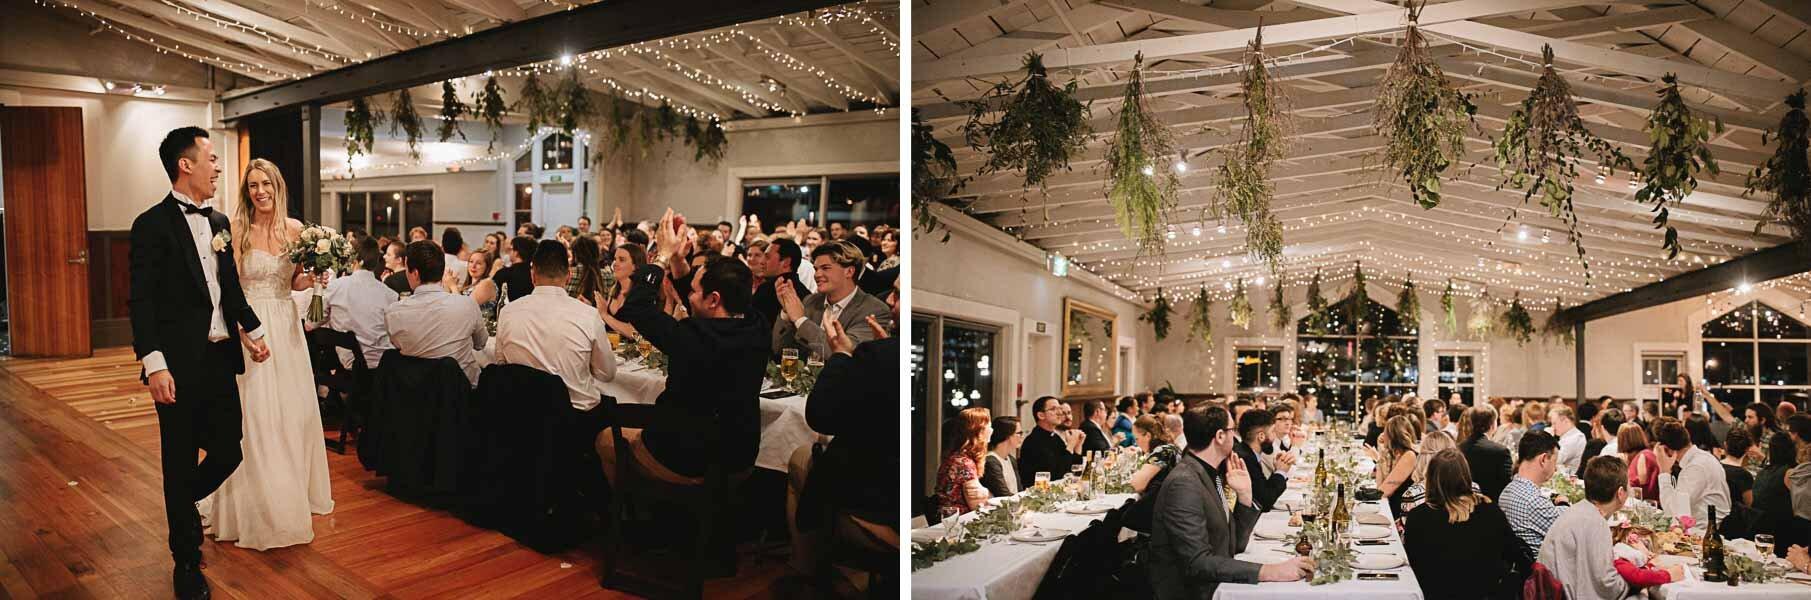 The Boatshed wedding reception wellington.jpg